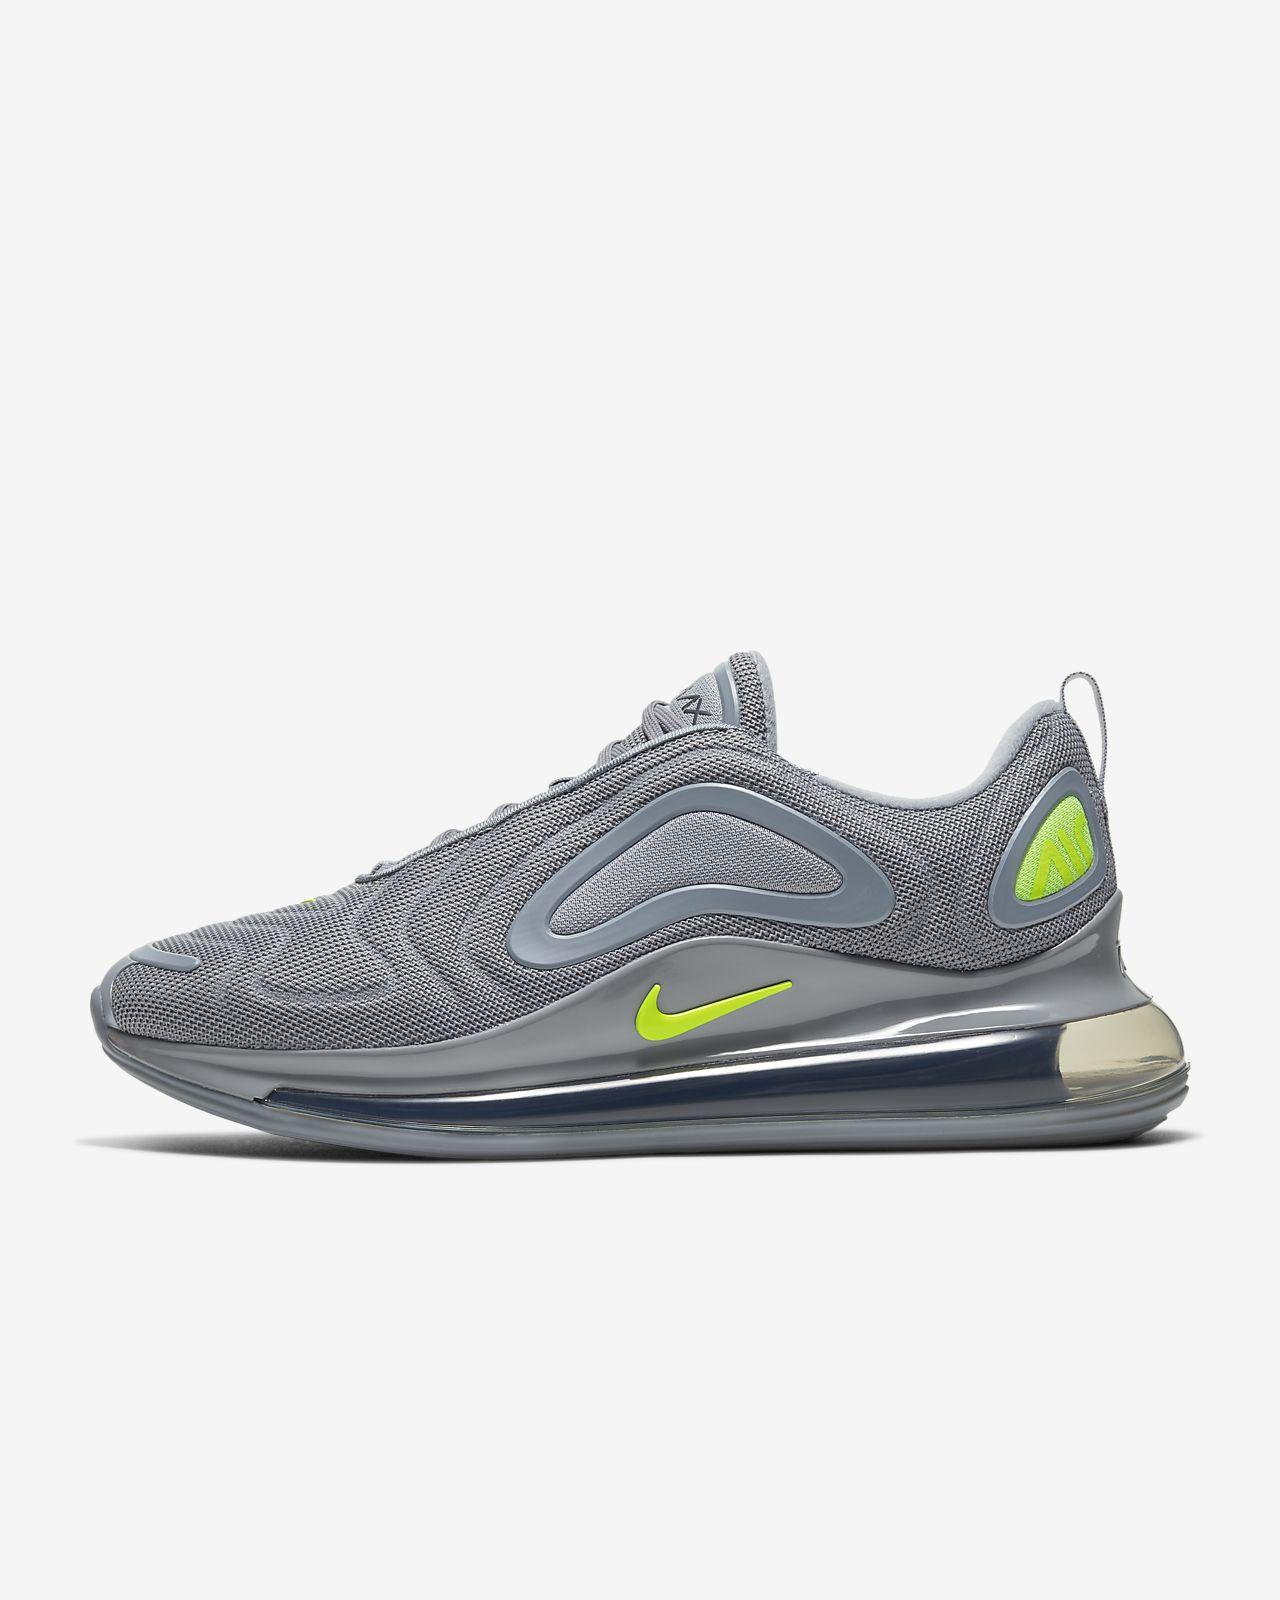 air max 720 nike scarpe uomo